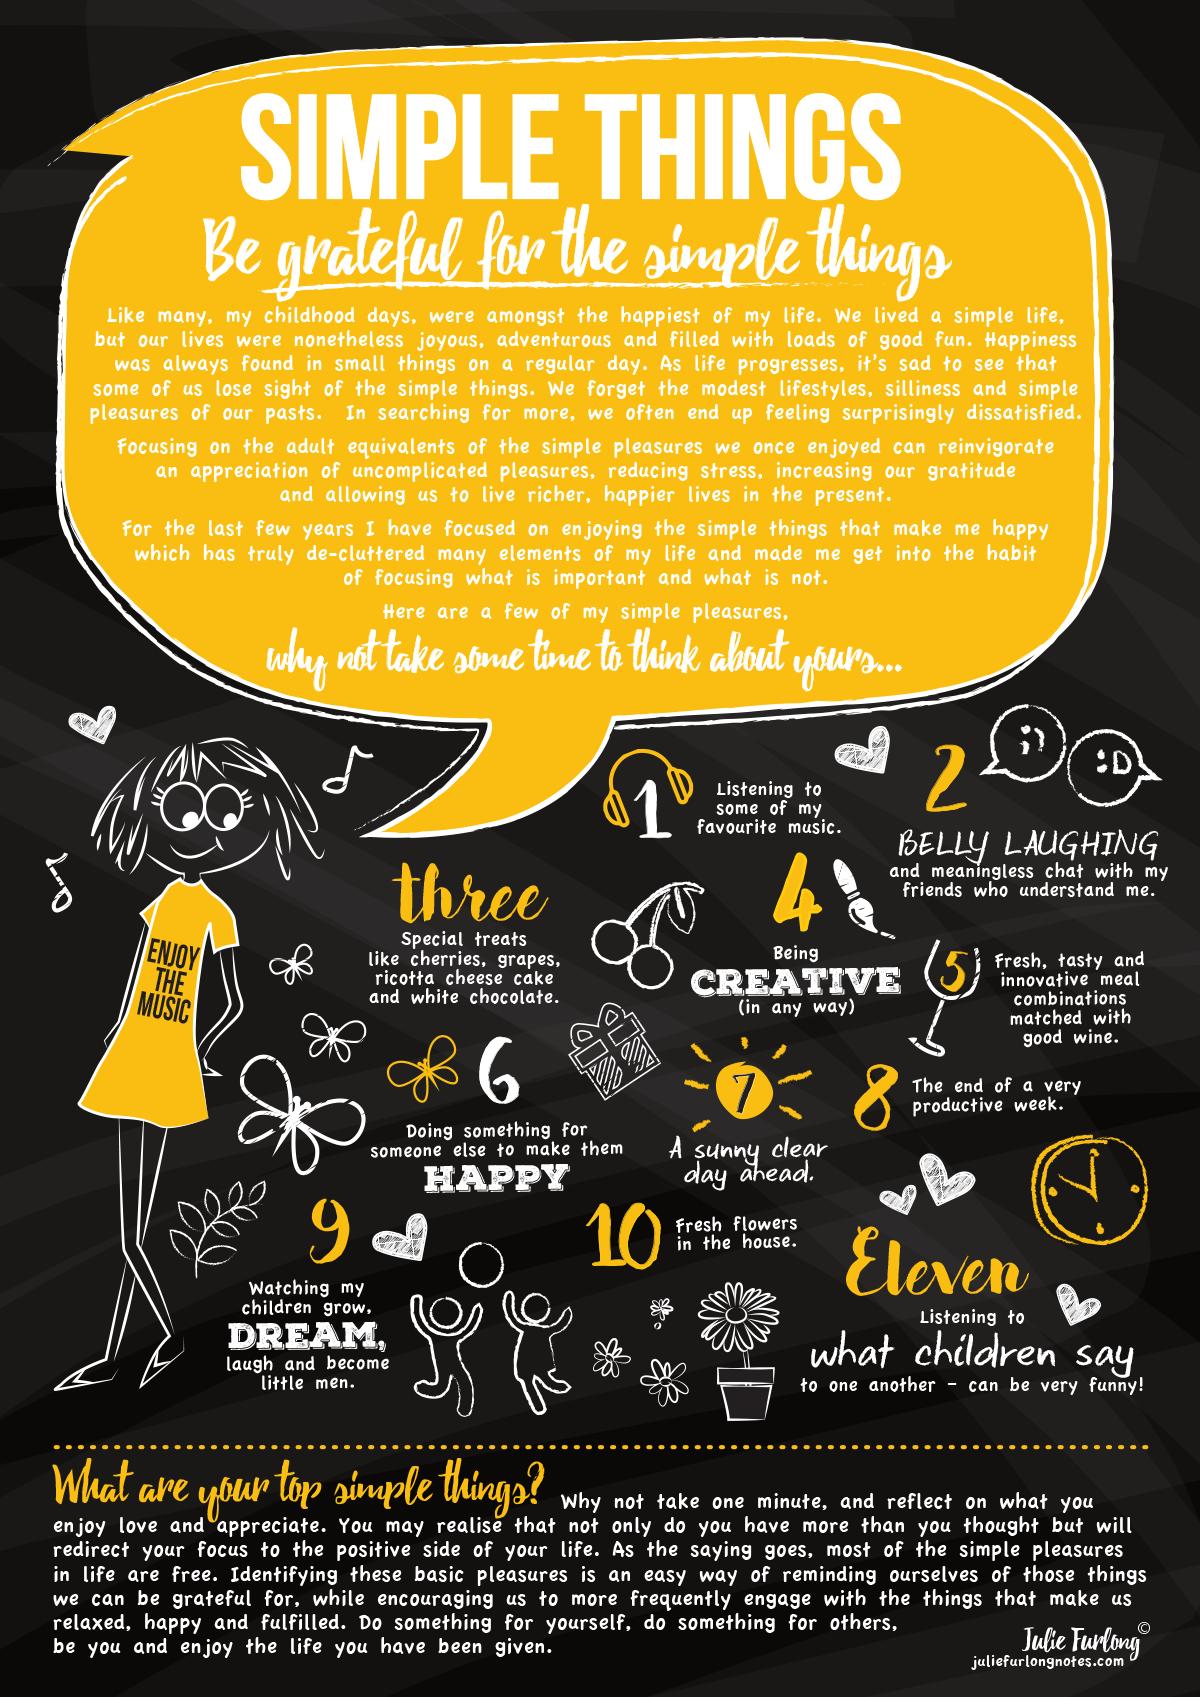 11 Simple pleasures to enjoy life